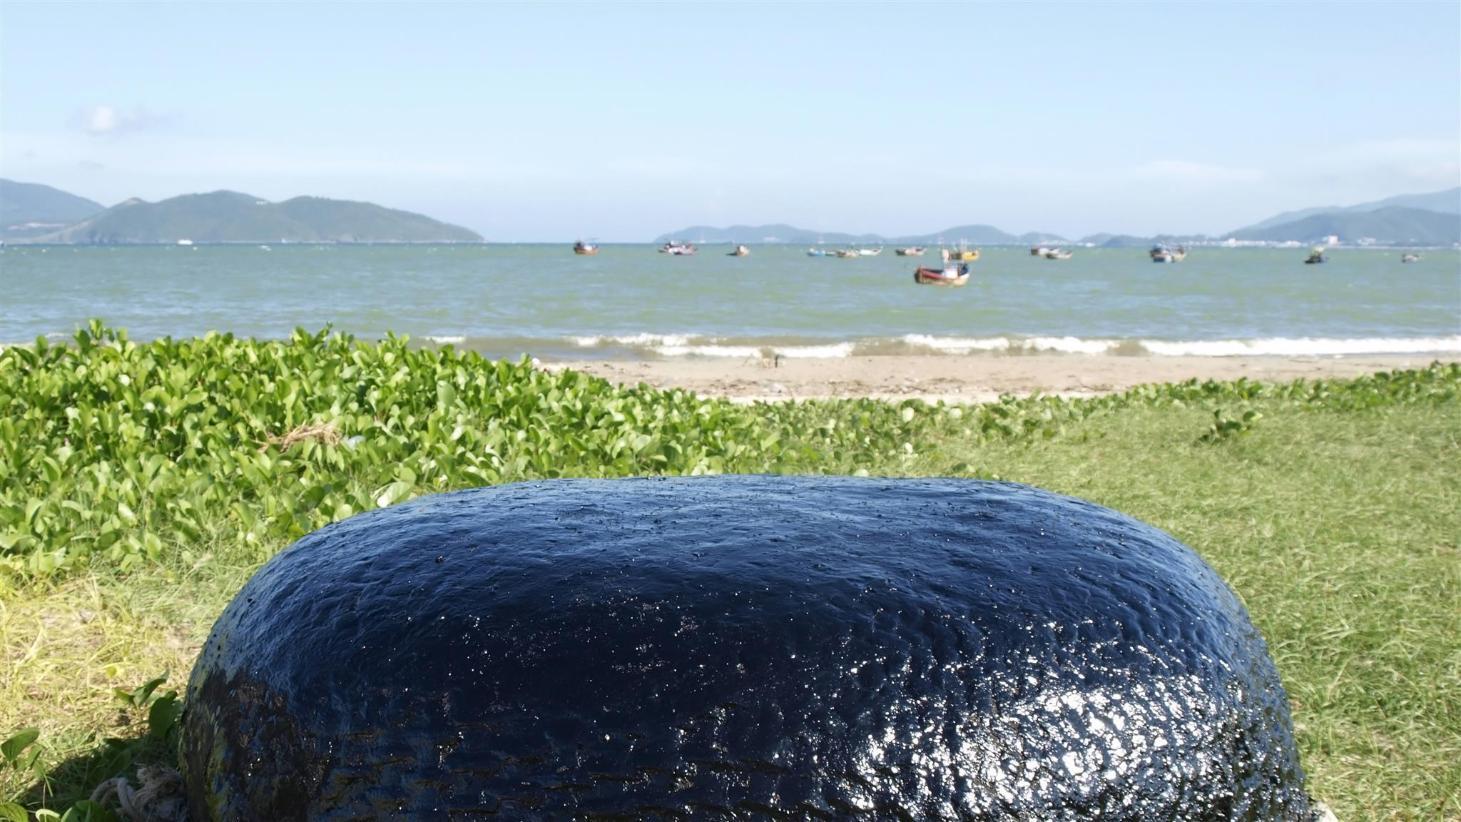 Die 12 Besten Hotels In Cua Lo Beach Vietnam Ab 10 Agoda Com